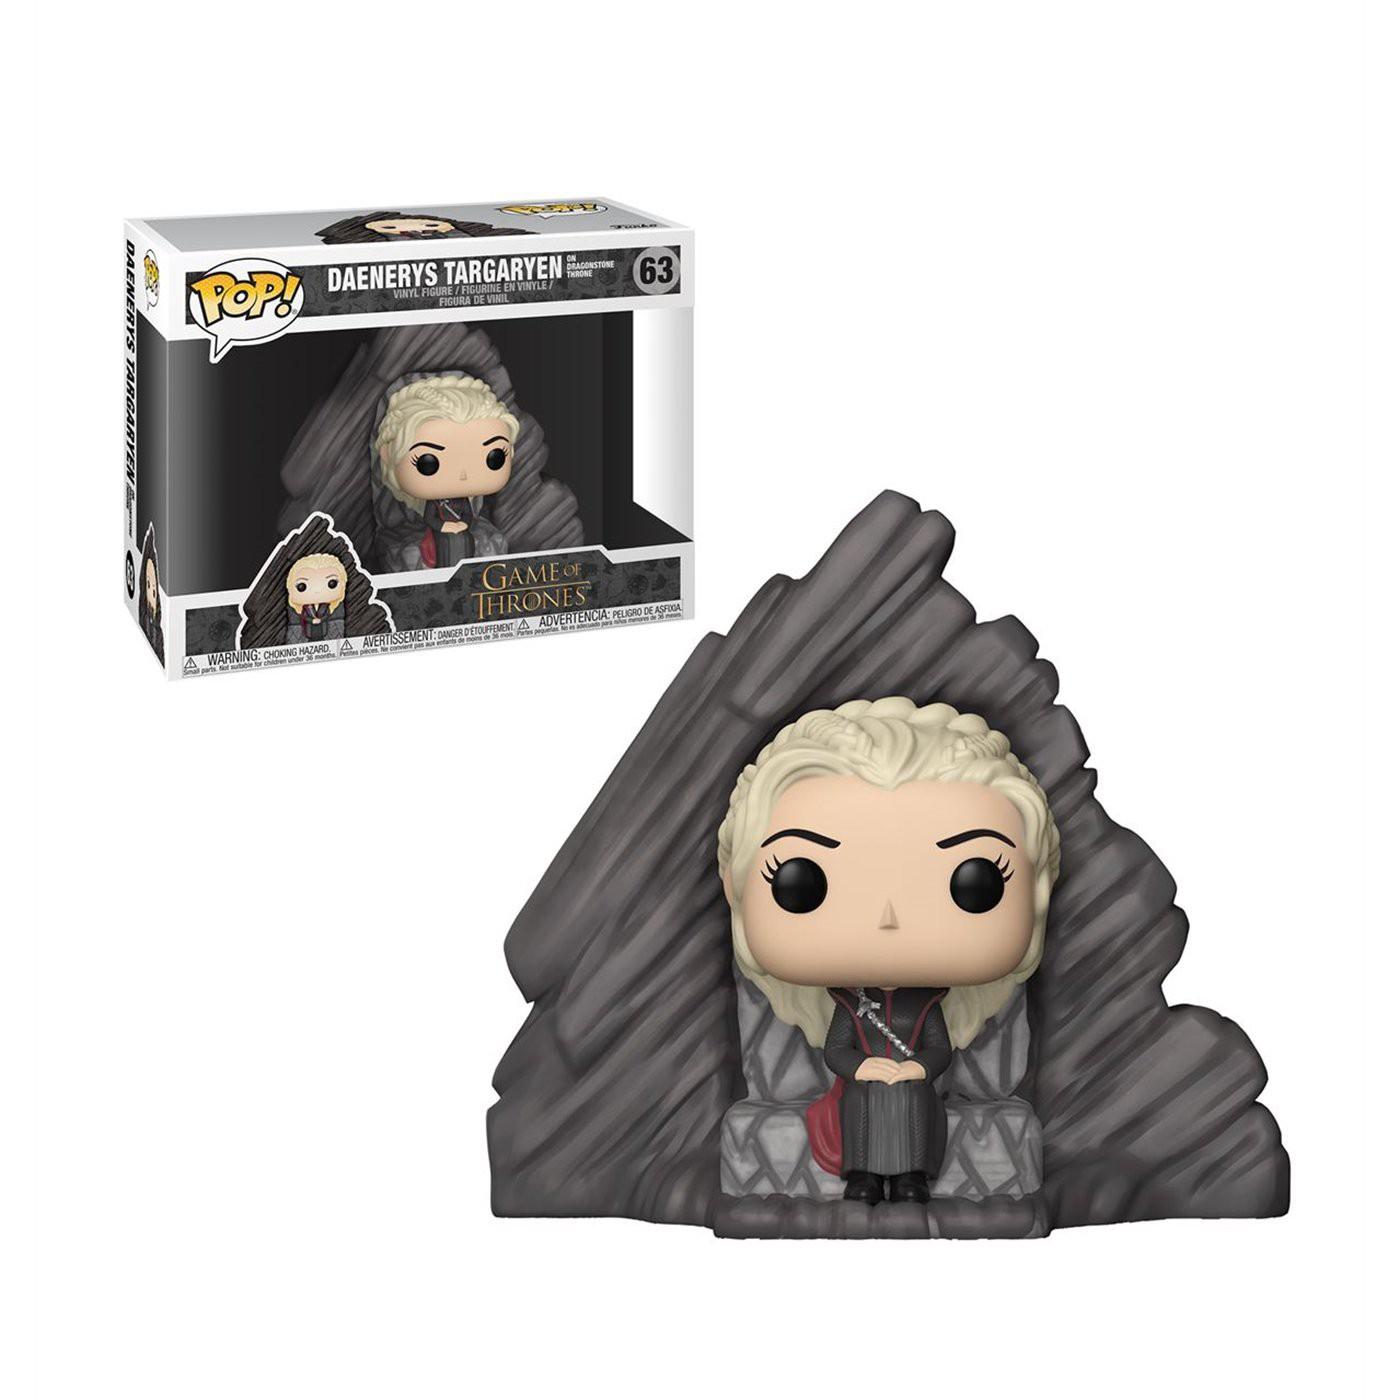 Game of Thrones Daenerys Targaryen Funko Pop Deluxe